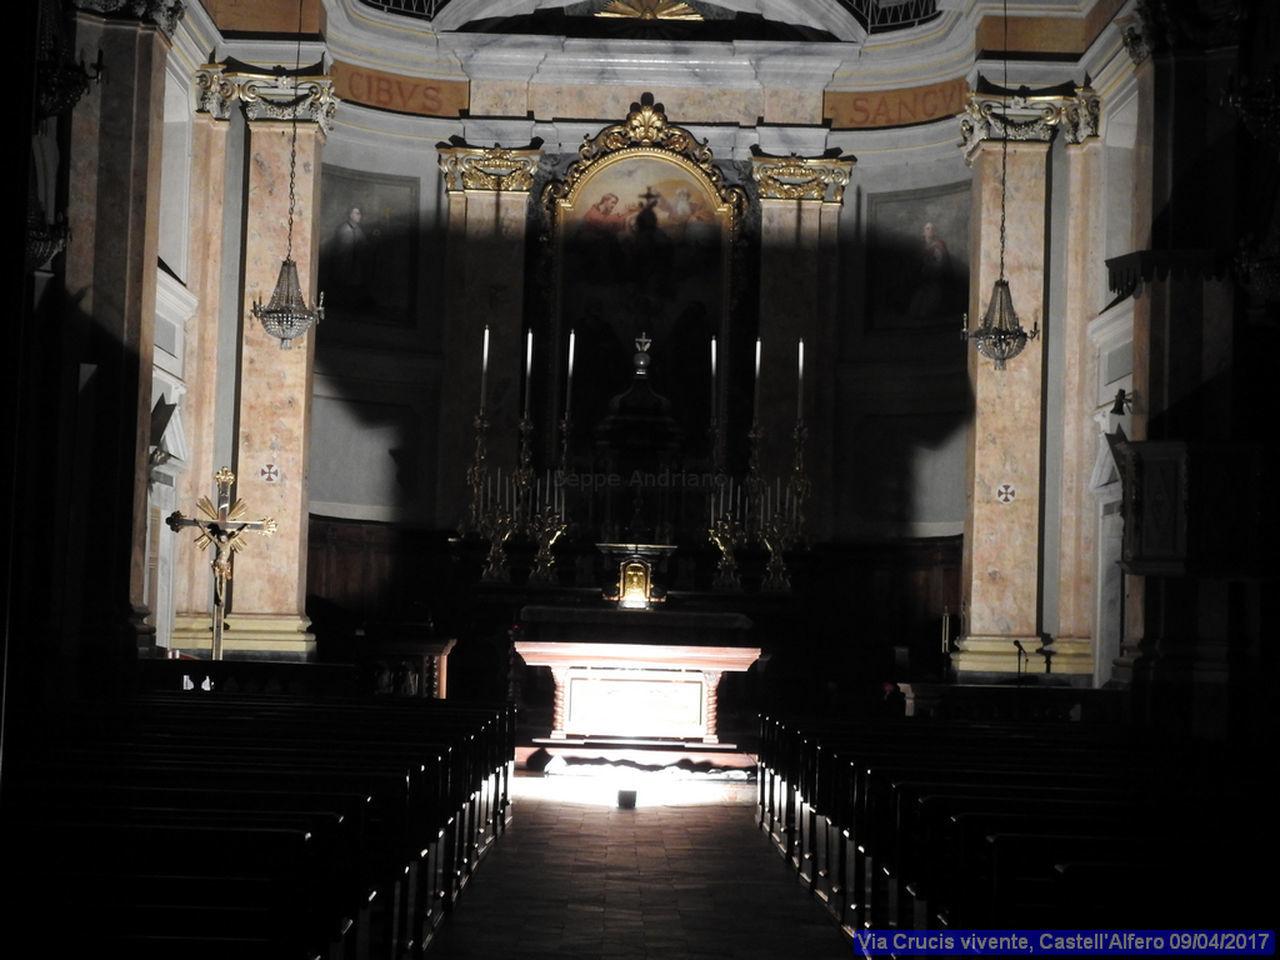 #religion #viacrucisvivente #viacrucis #castellalfero #italy #monferrato #unesco #asti #pedement Arts Culture And Entertainment Place Of Worship Religion